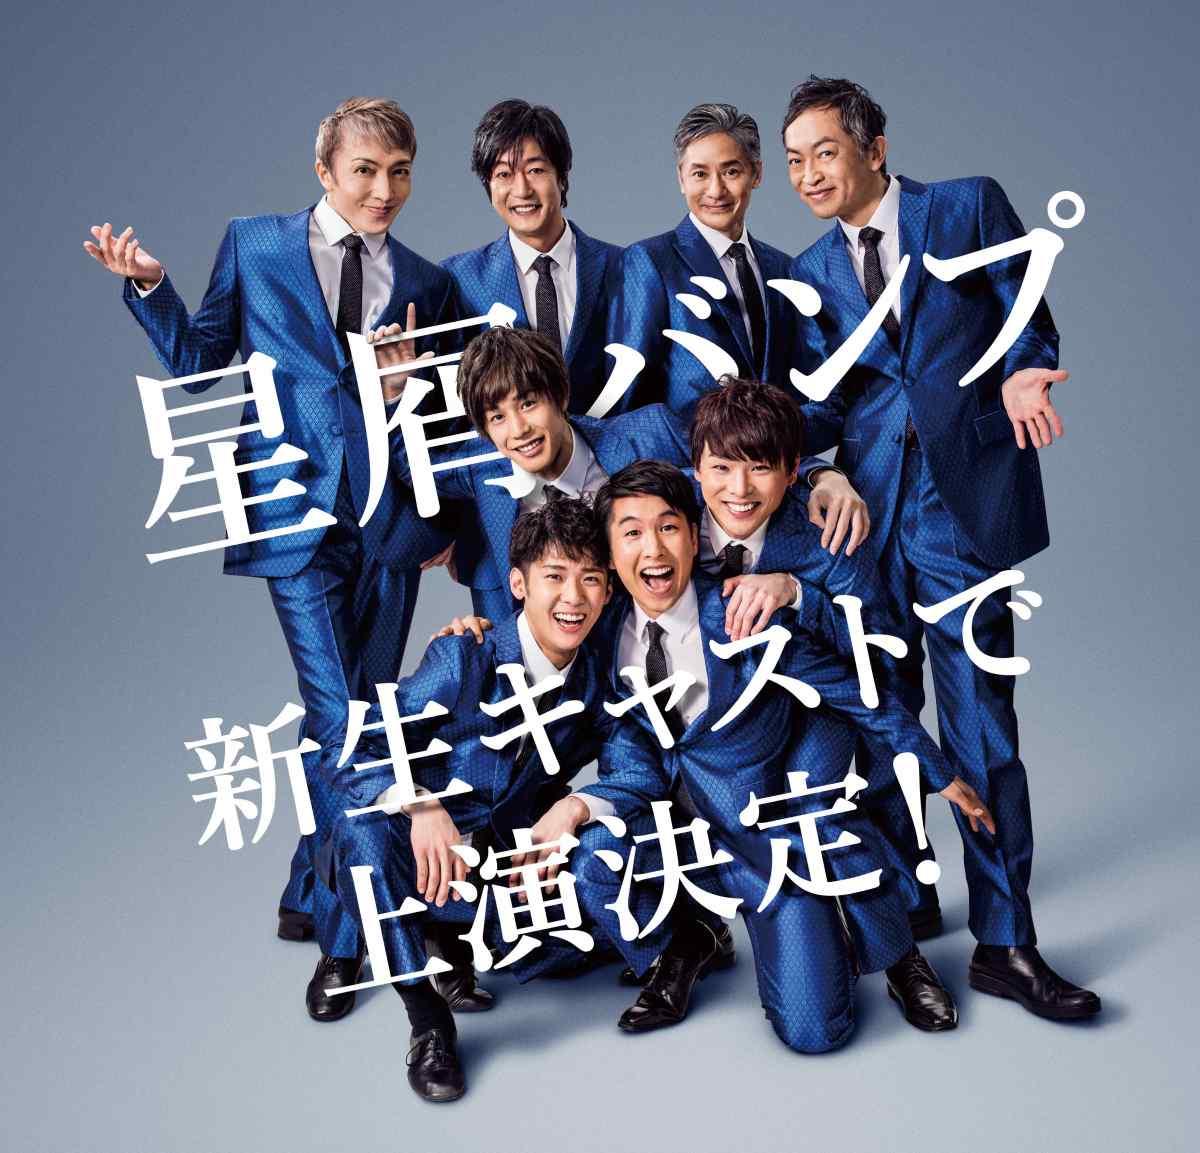 THE CONVOY SHOW vol.35 「星屑バンプ」新キャストに加藤良輔を迎え、9月上演決定!!